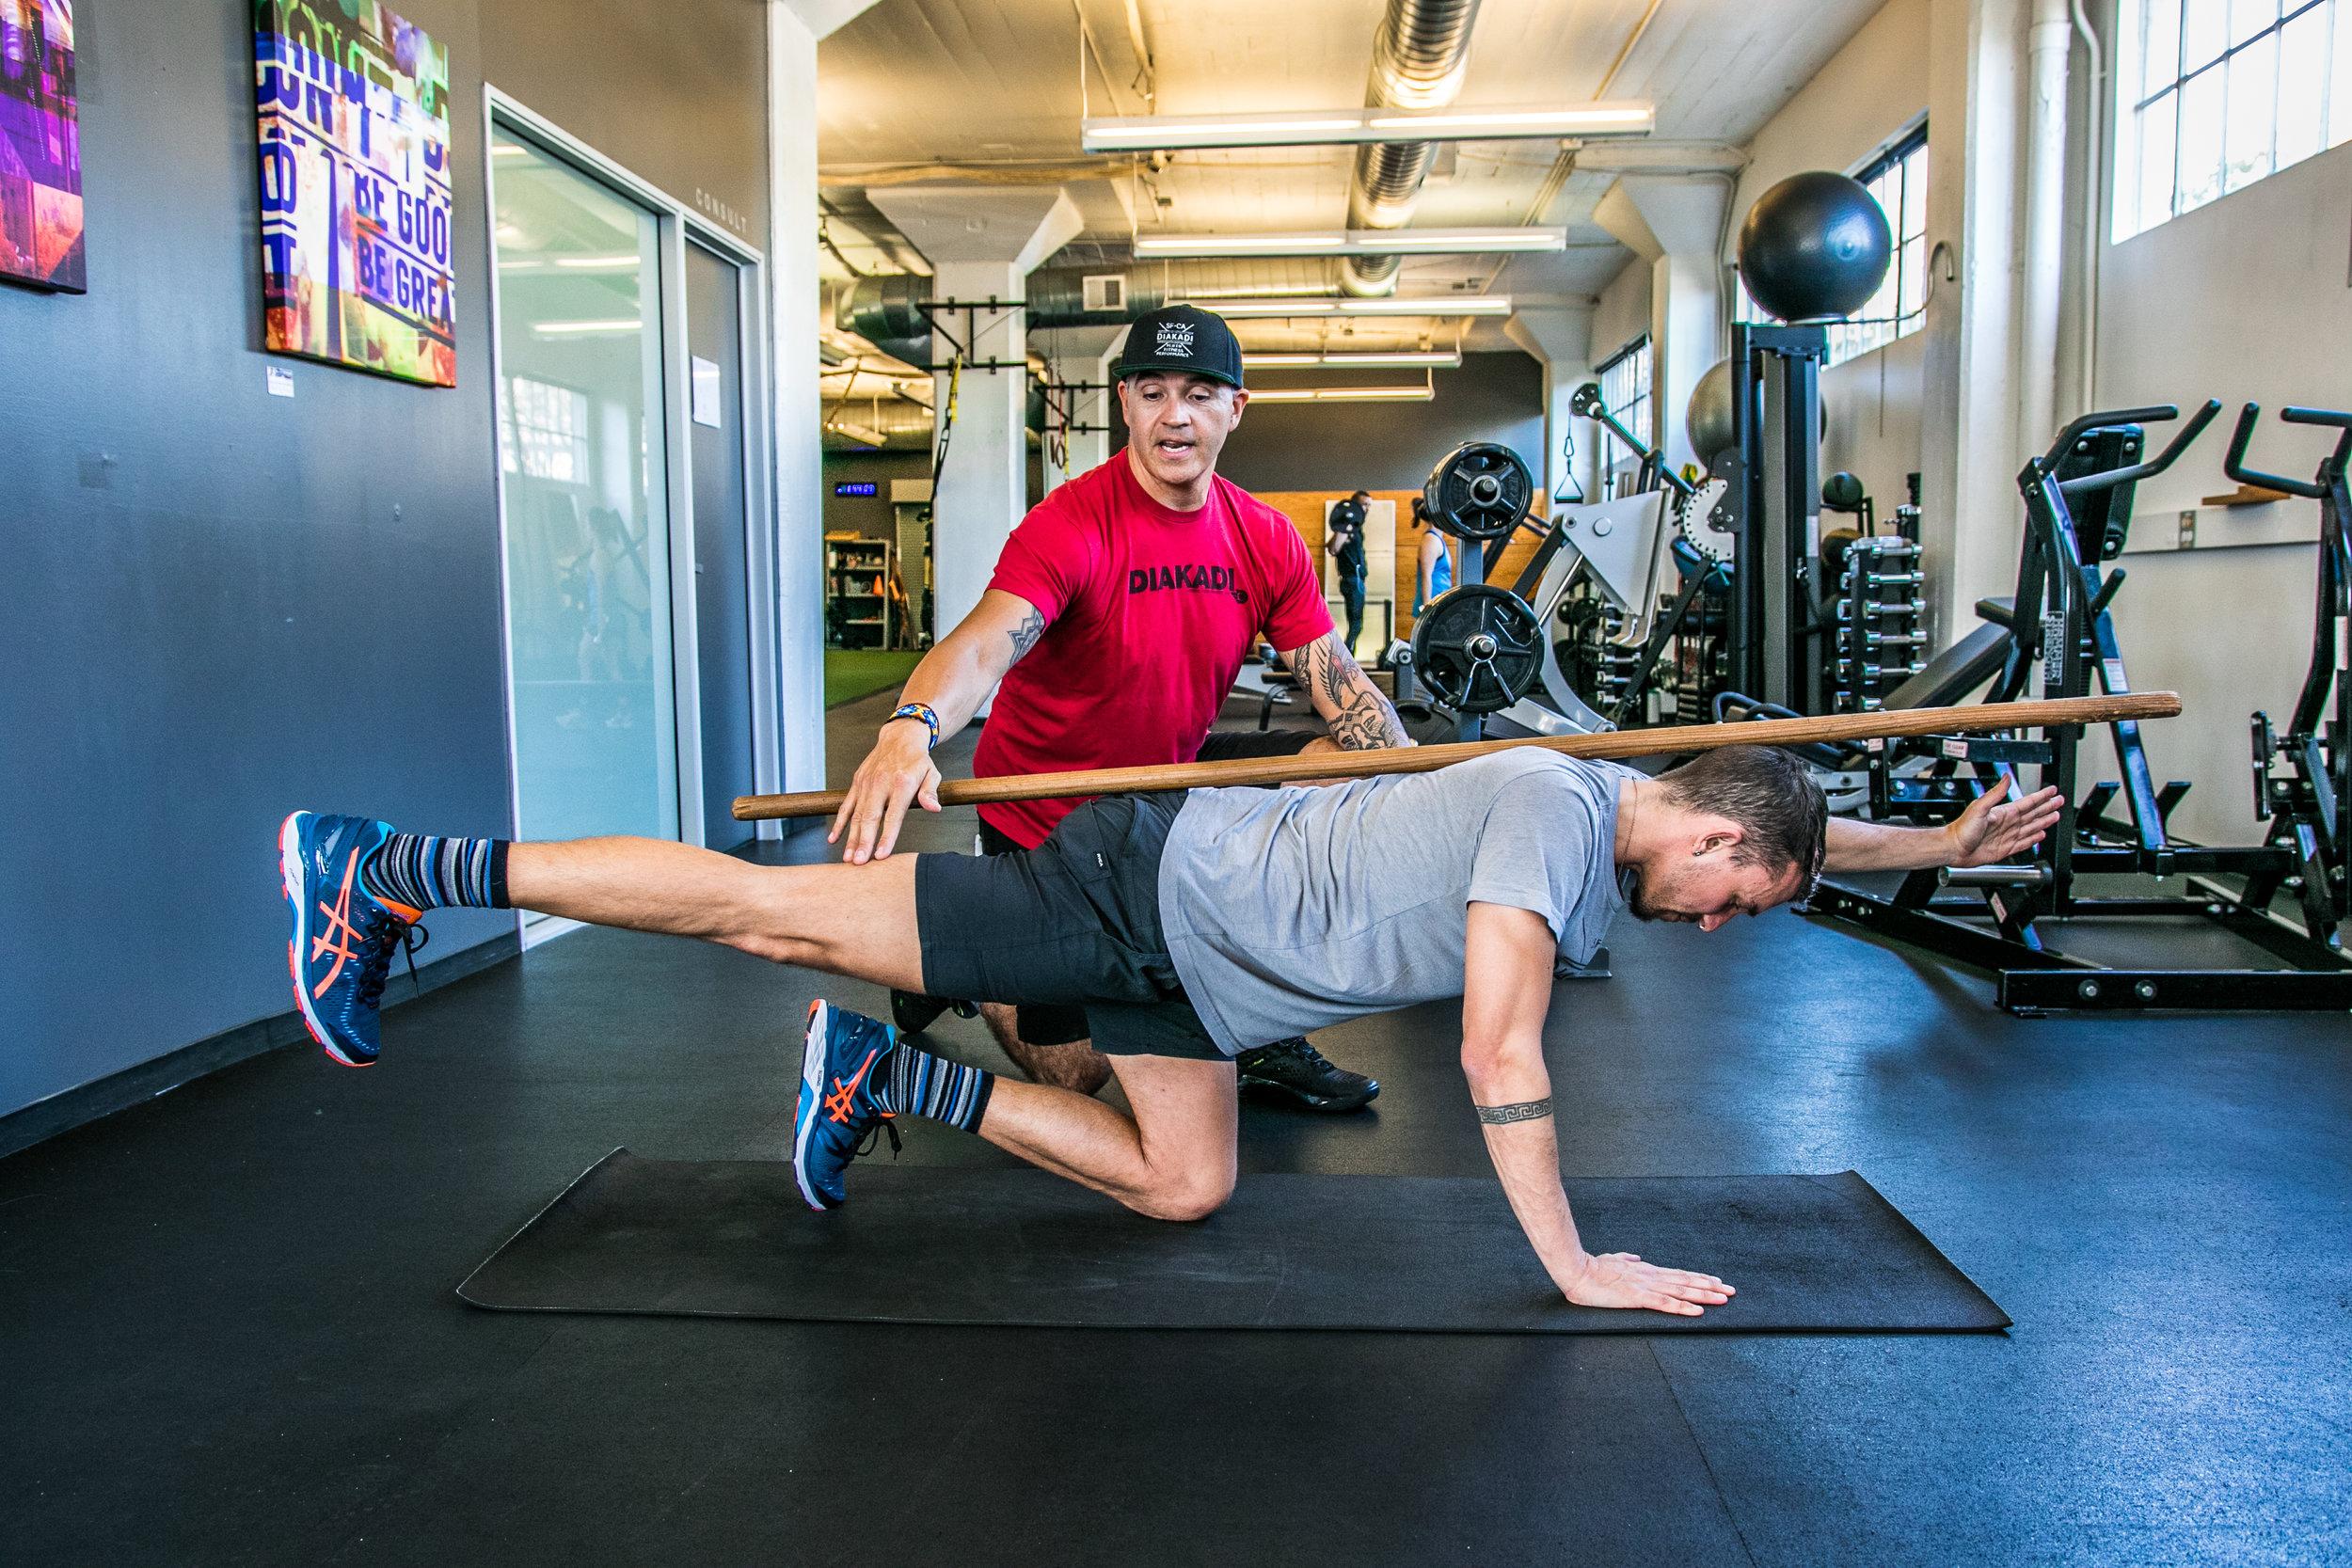 DIAKADI Trainer Tommy Armenta bird-dog posture improvement.jpg